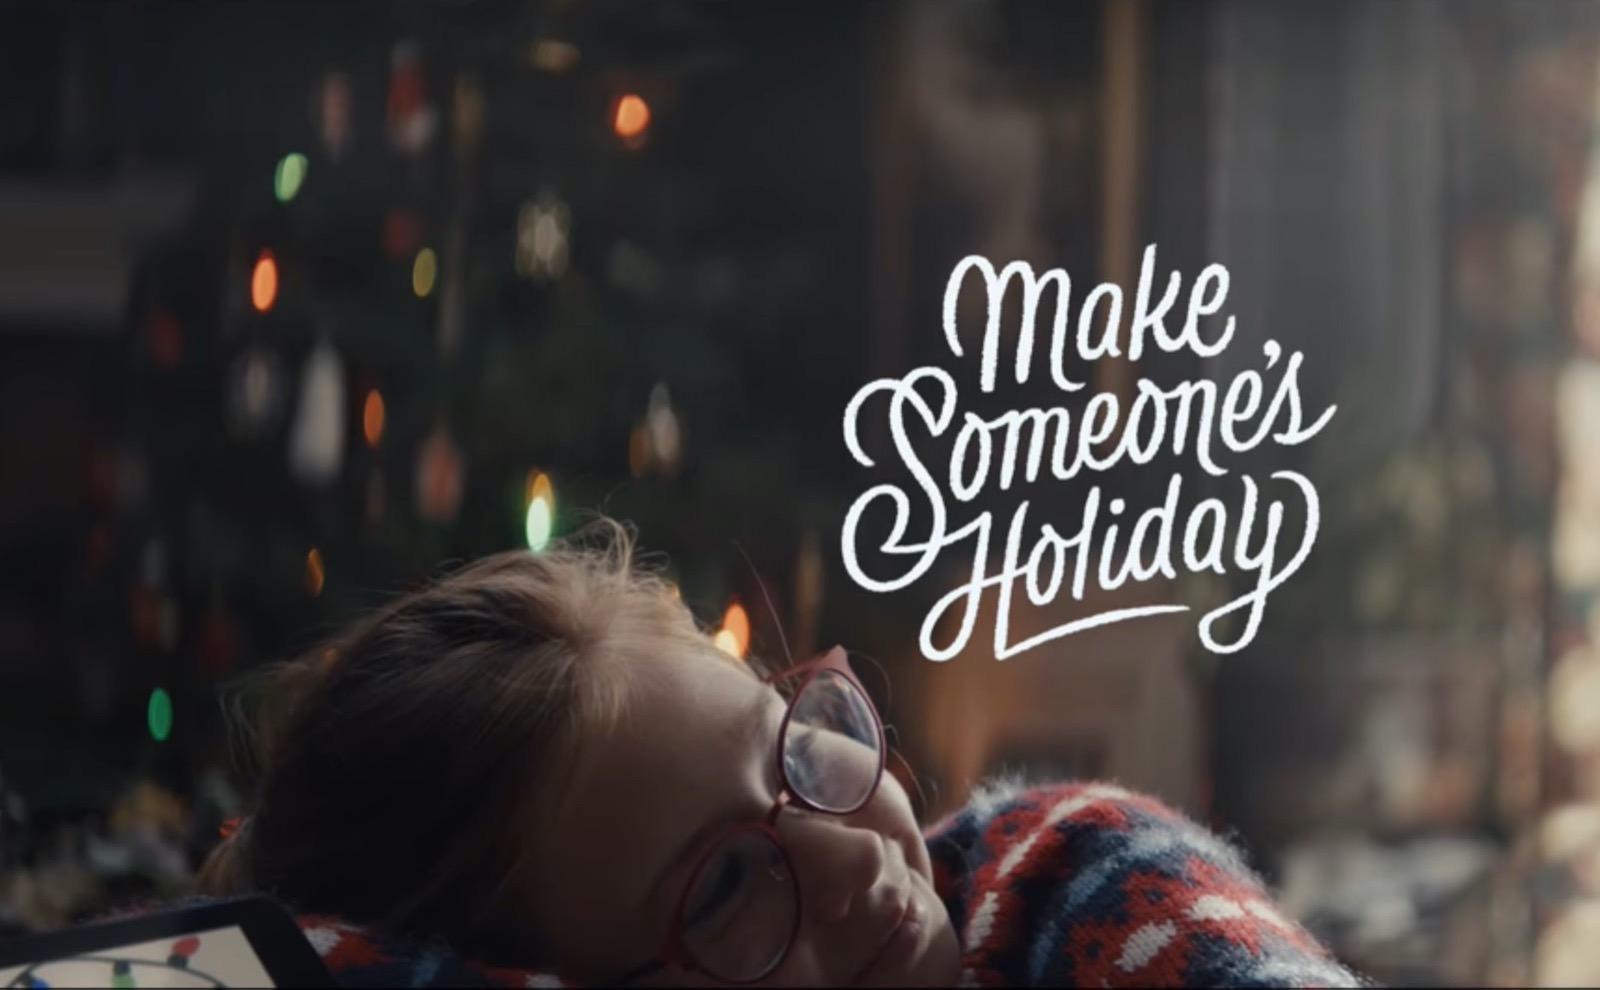 Make Someones Holiday